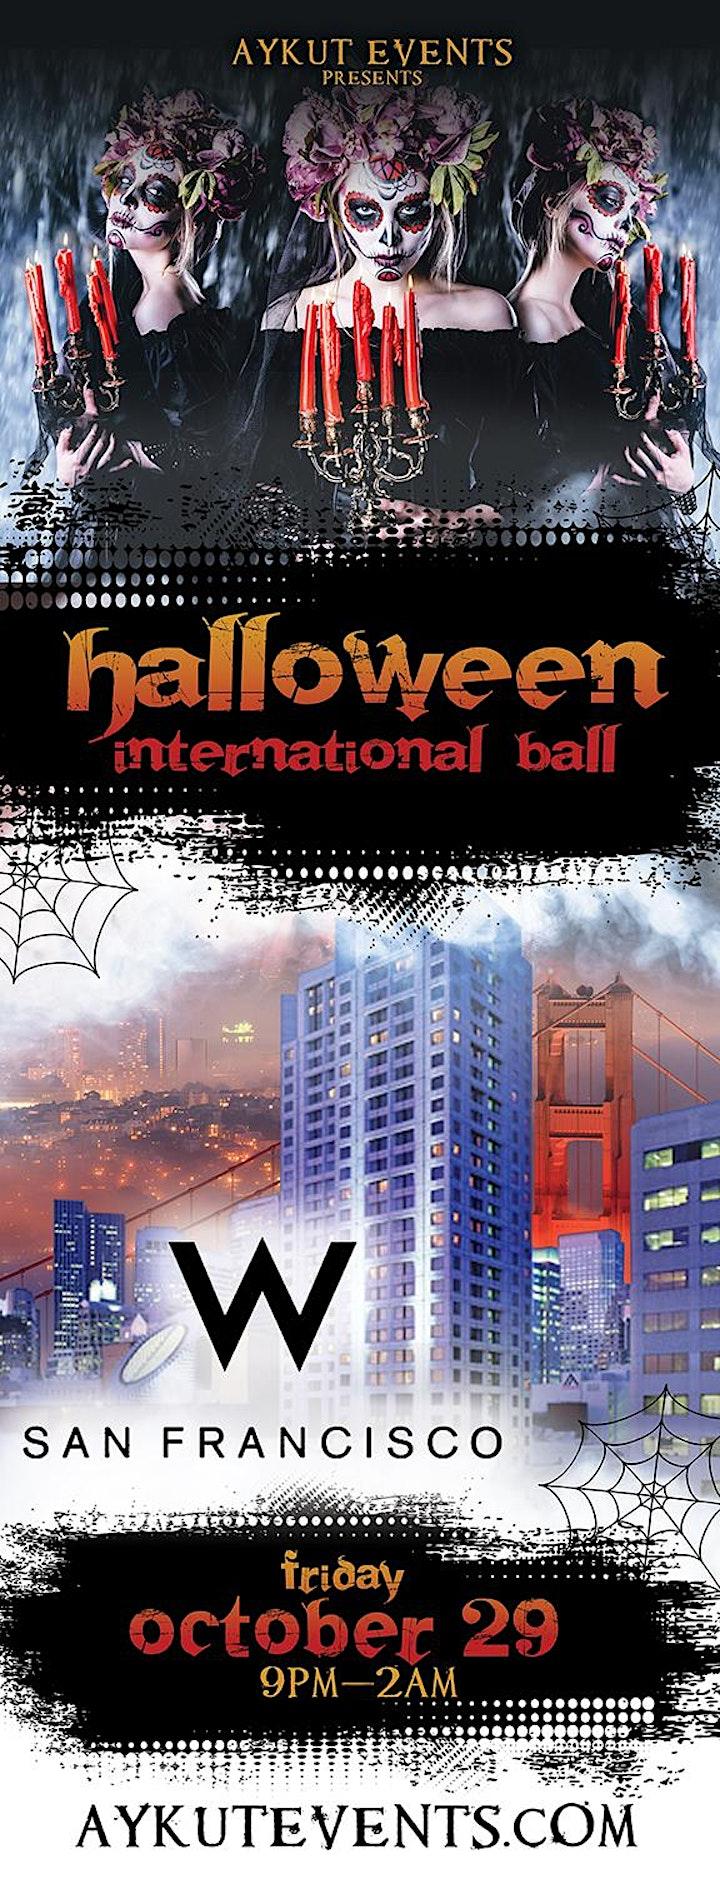 W Hotel Halloween Party San Francisco image